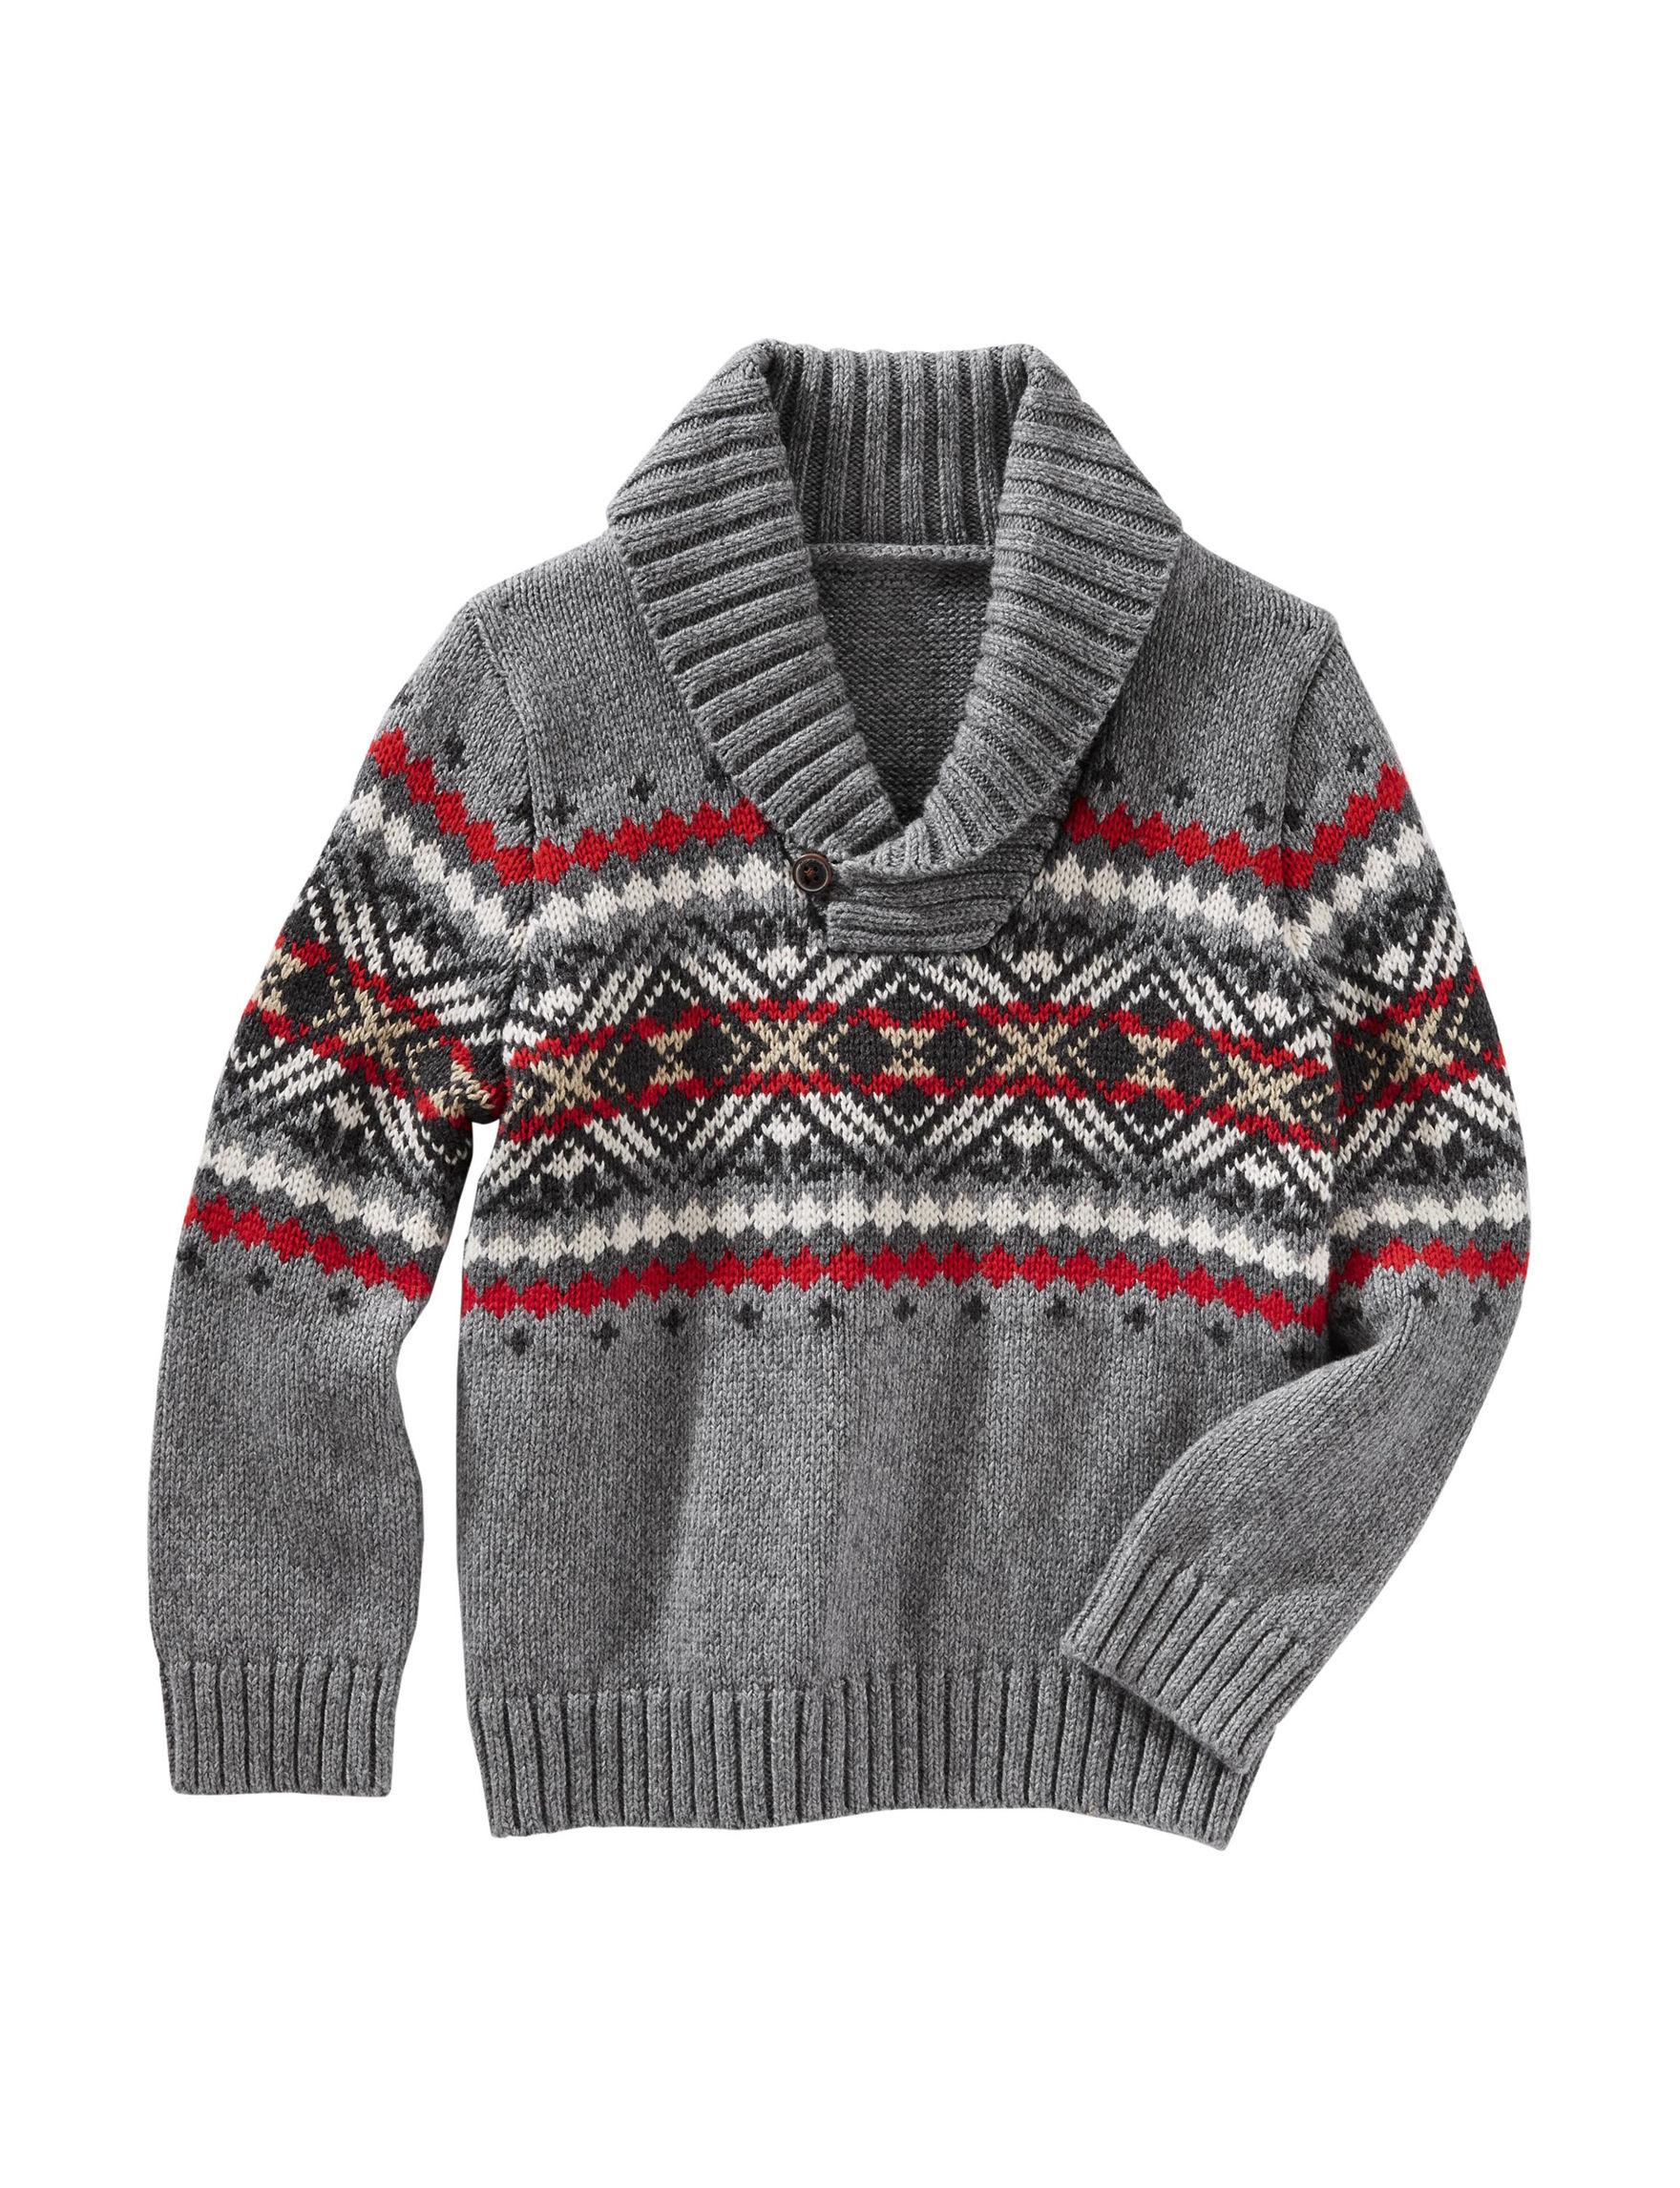 Oshkosh B'gosh Fair Isle Sweater - Toddler Boys | Stage Stores